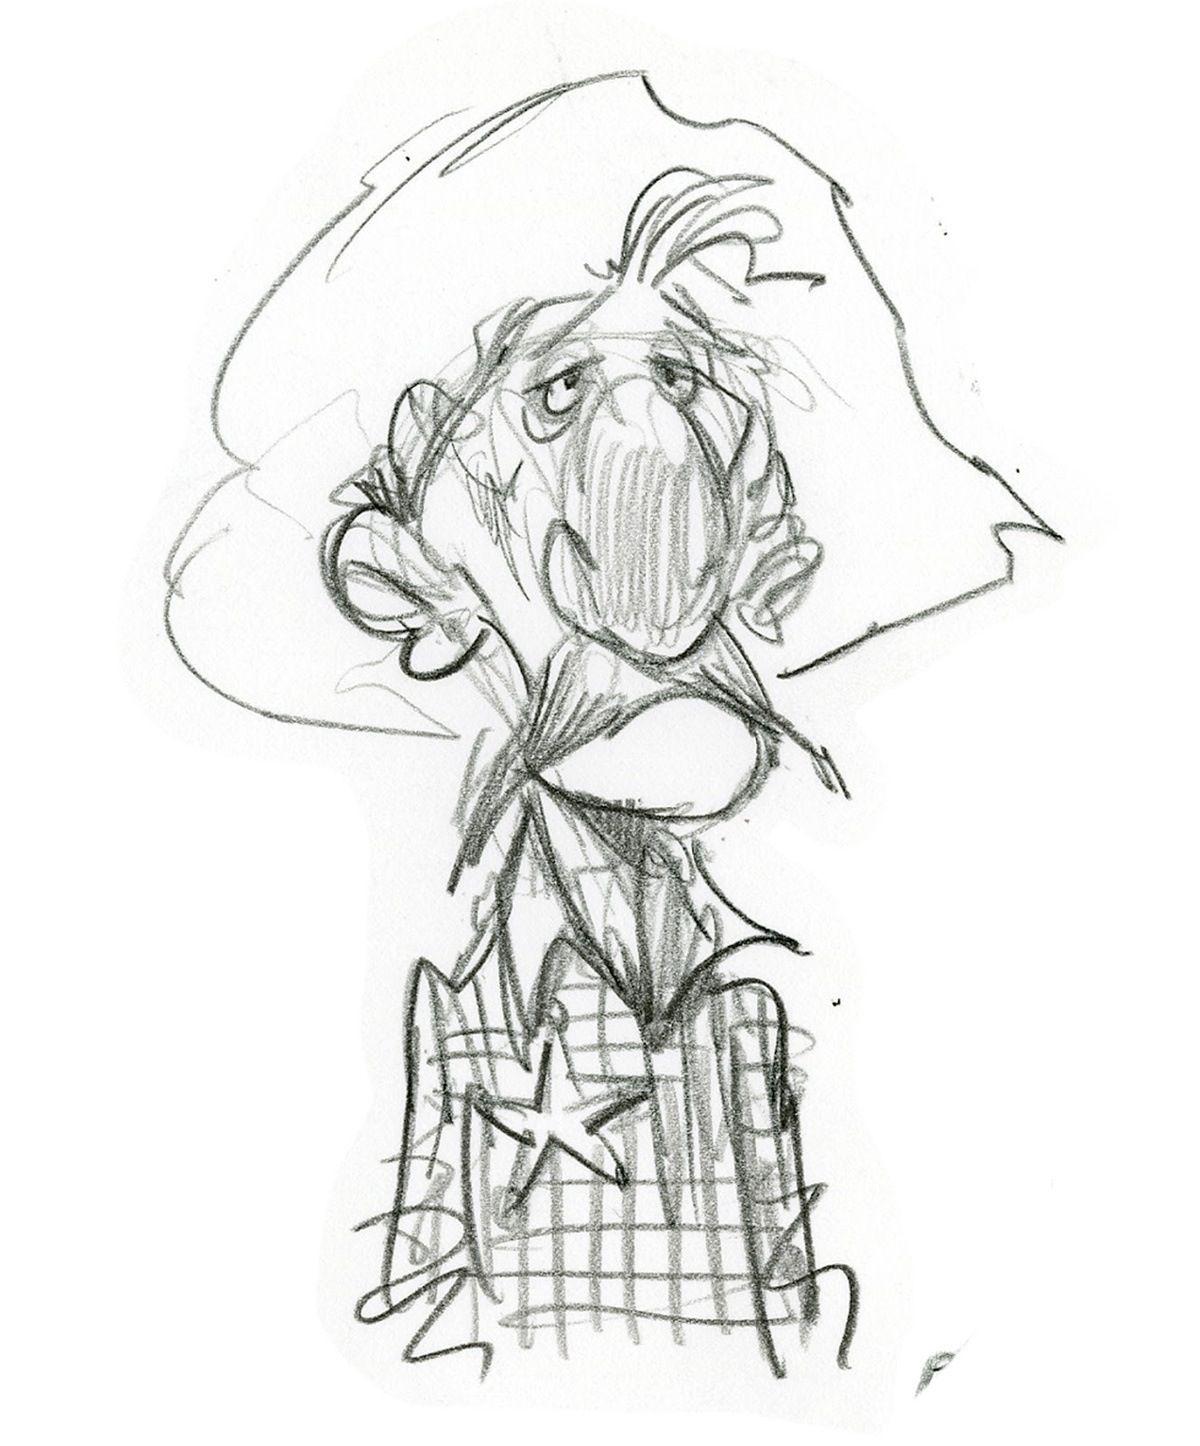 Pin de Lu🌸🌊 en draw | Pinterest | Dibujo, Caricaturas y Diseño de ...